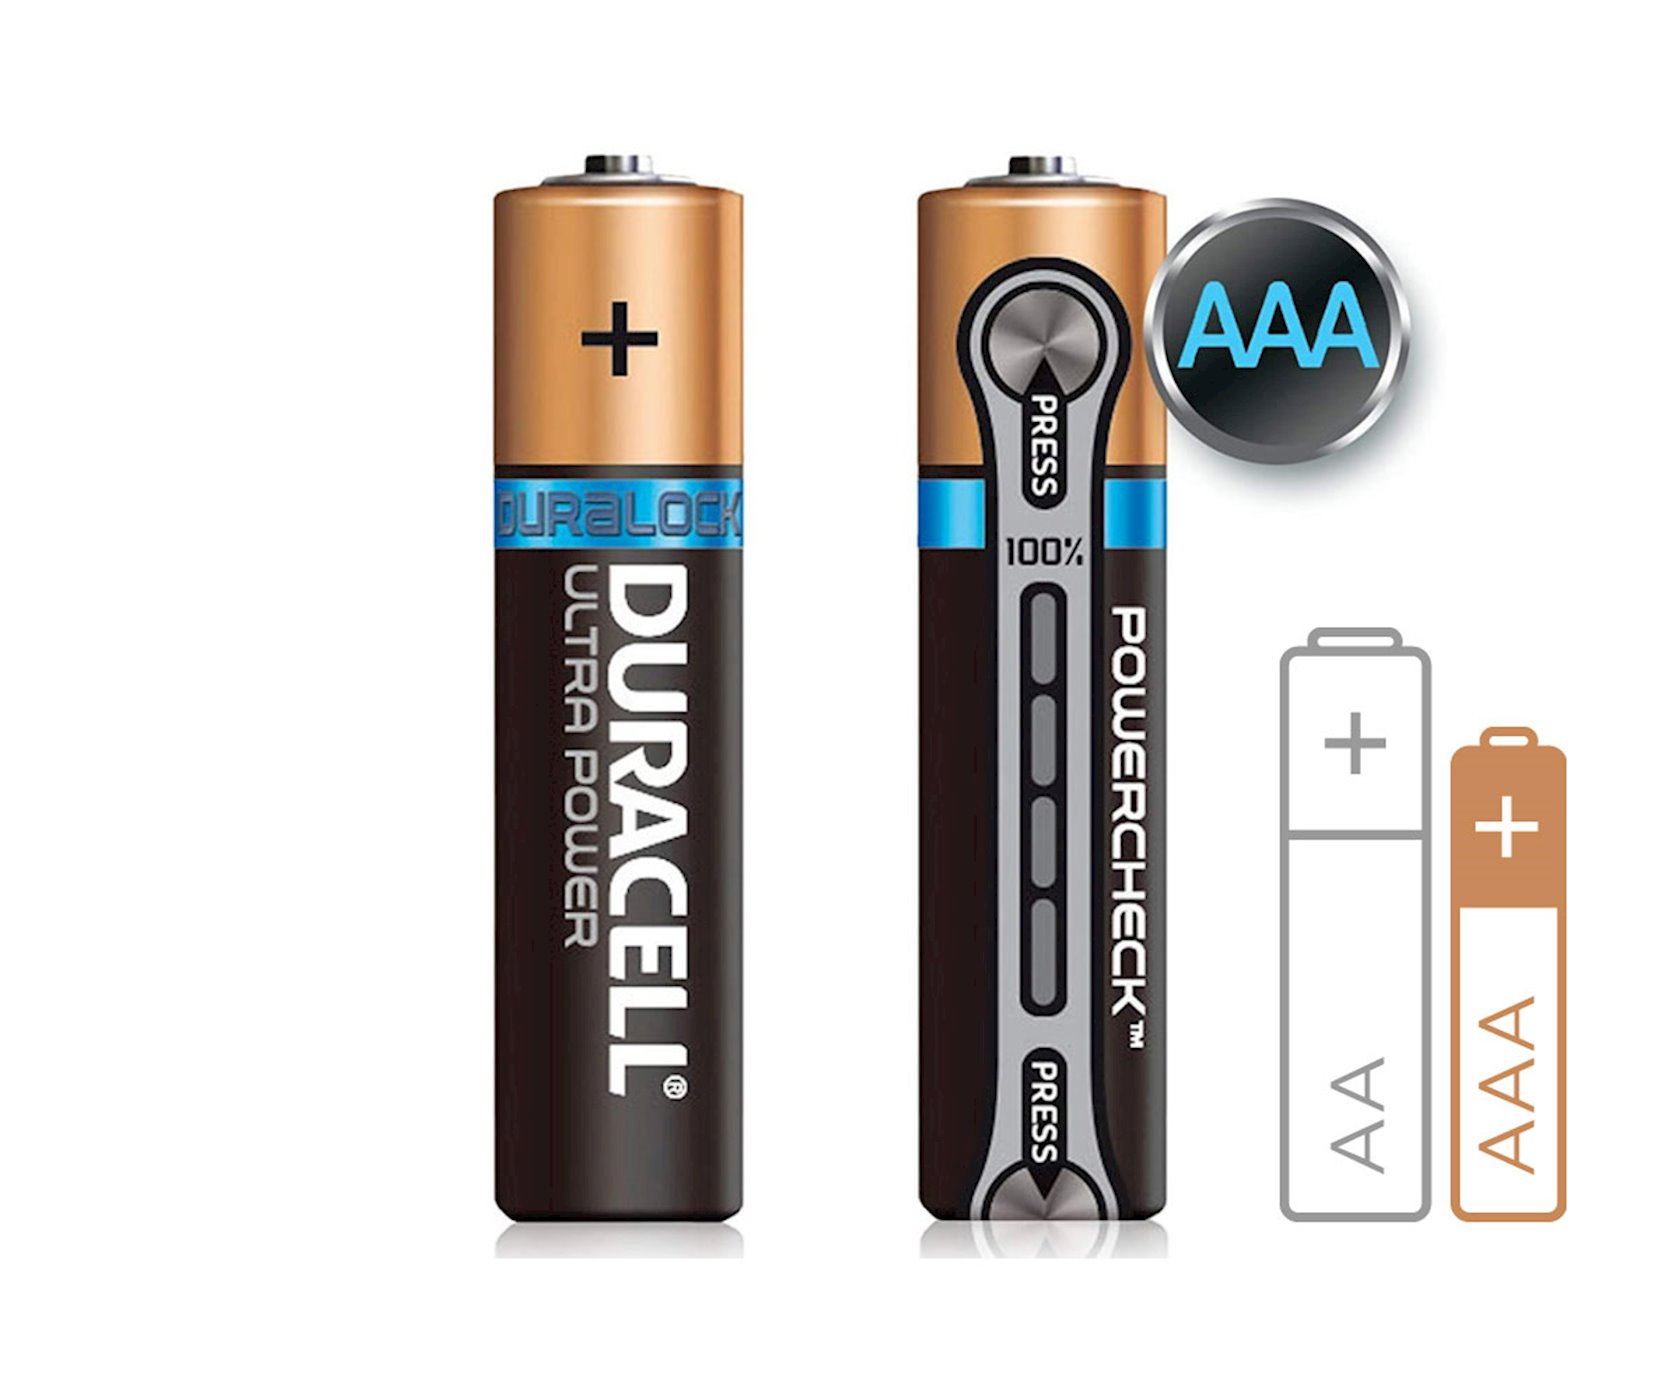 Batareya Duracell Ultra Power AAA LR03 MN2400, 1.5V, 4 əd, 78x84 mm, 44 q